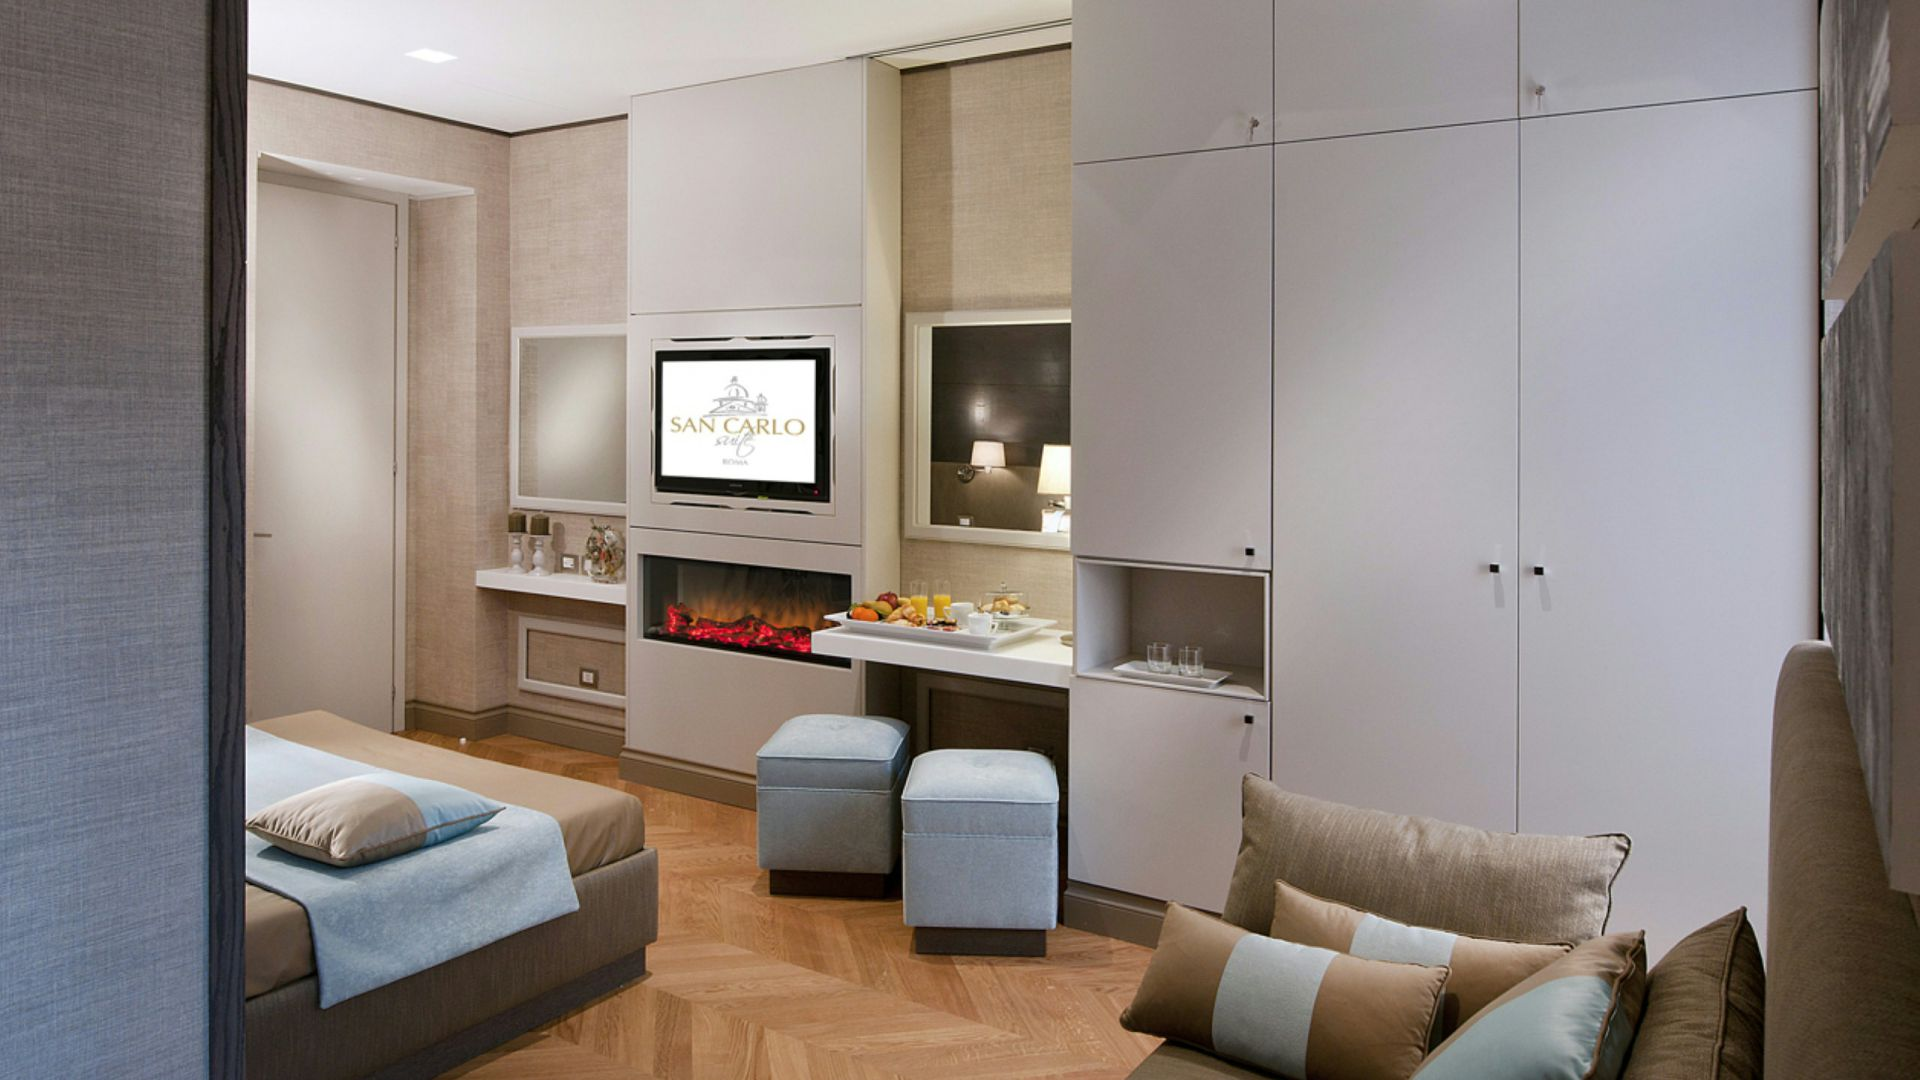 San-Carlo-Suite-Rom-deluxe-suite-2